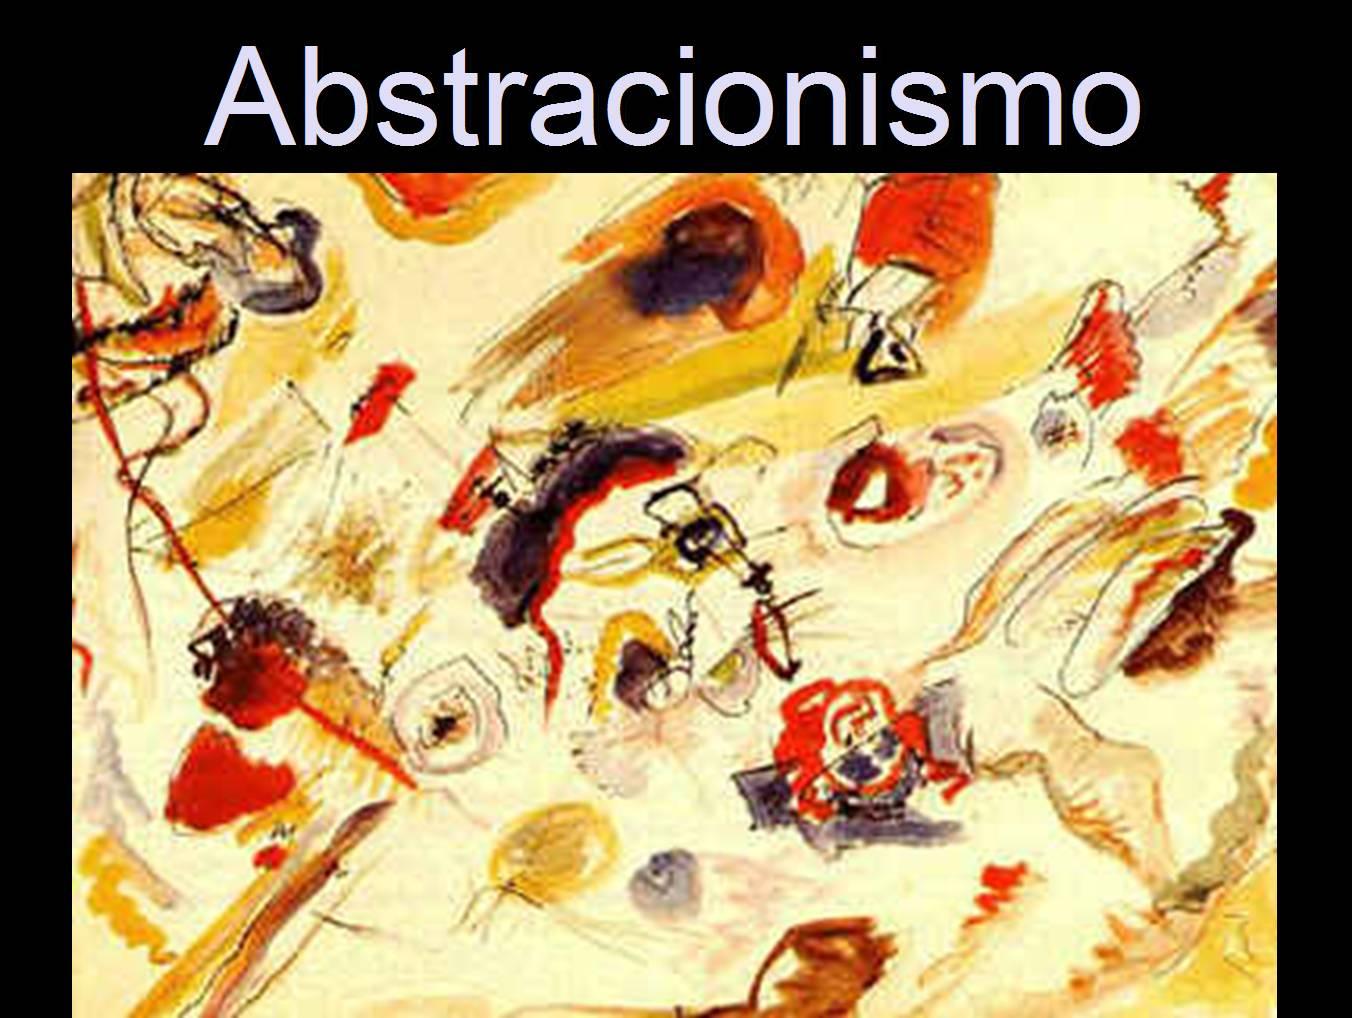 Abstracionismo na pintura